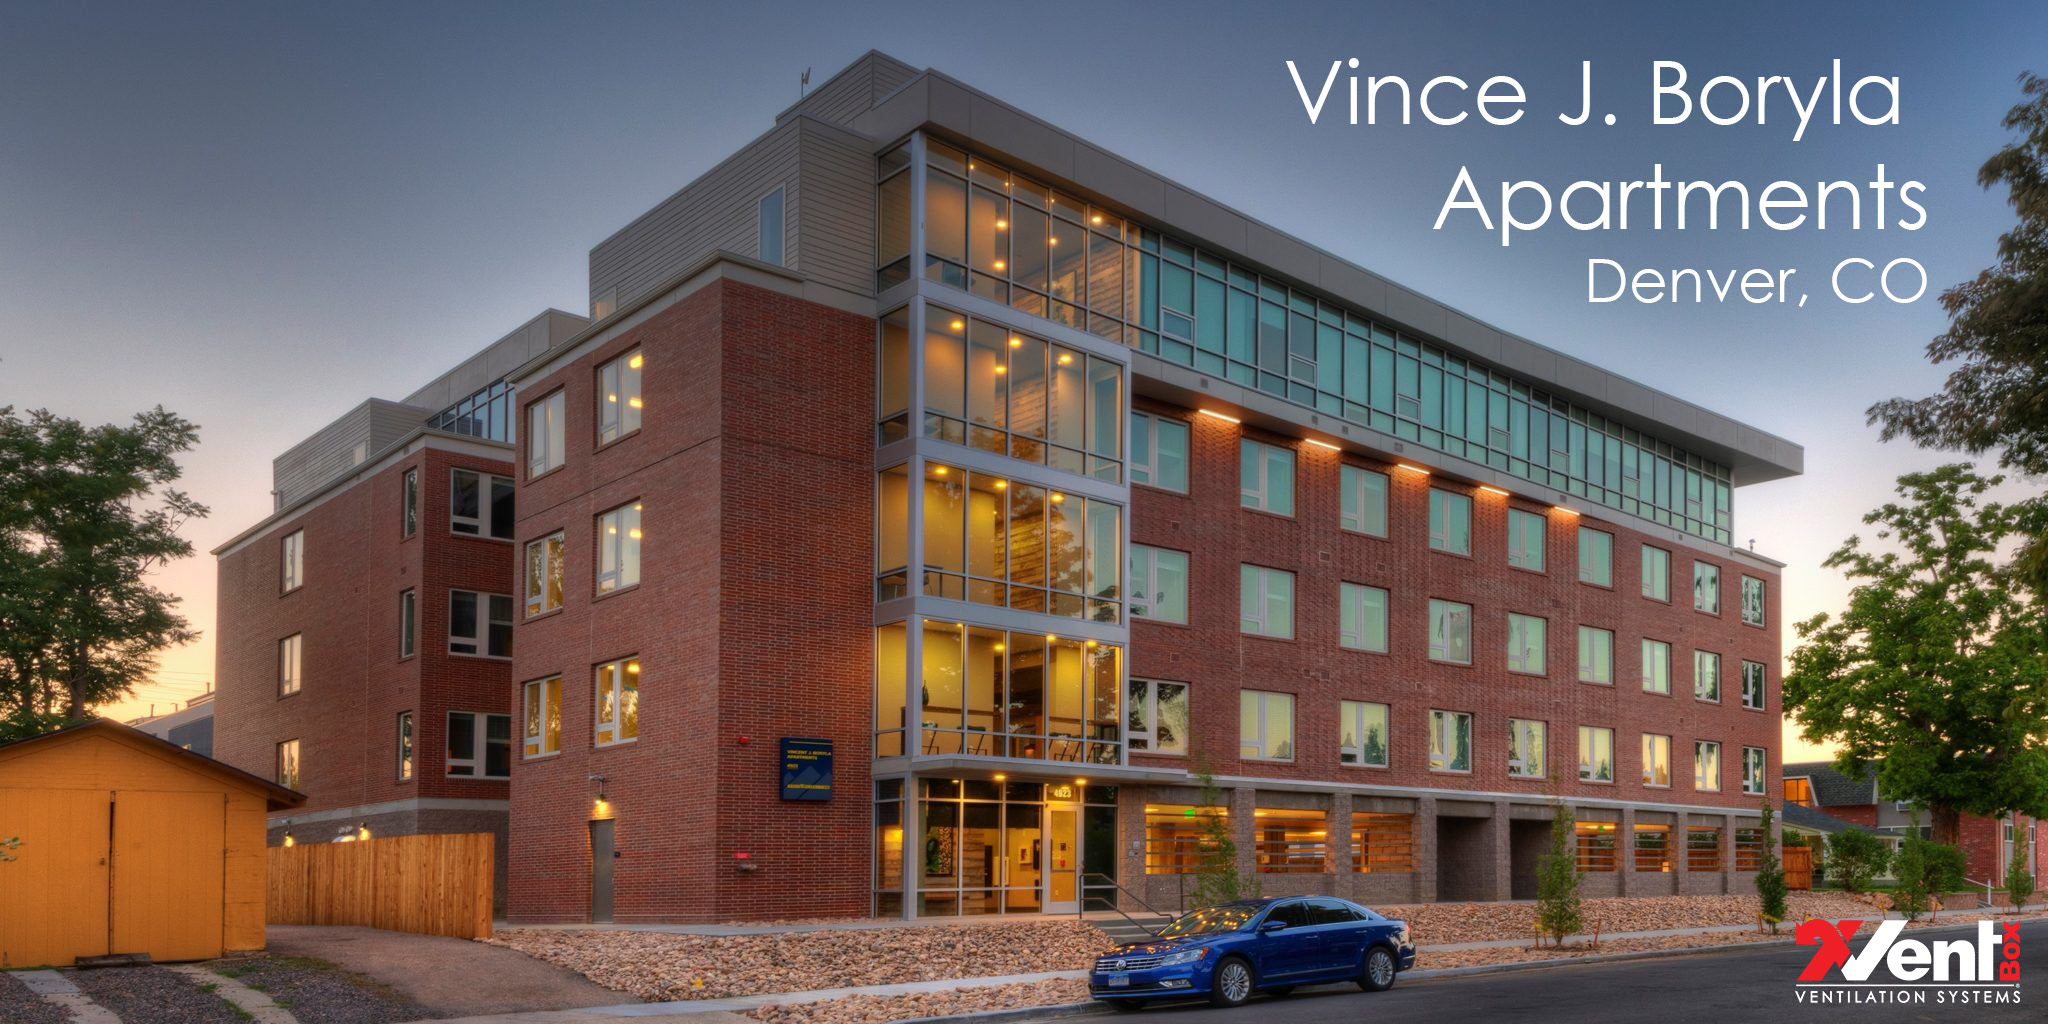 Vince J. Boryla Apartments